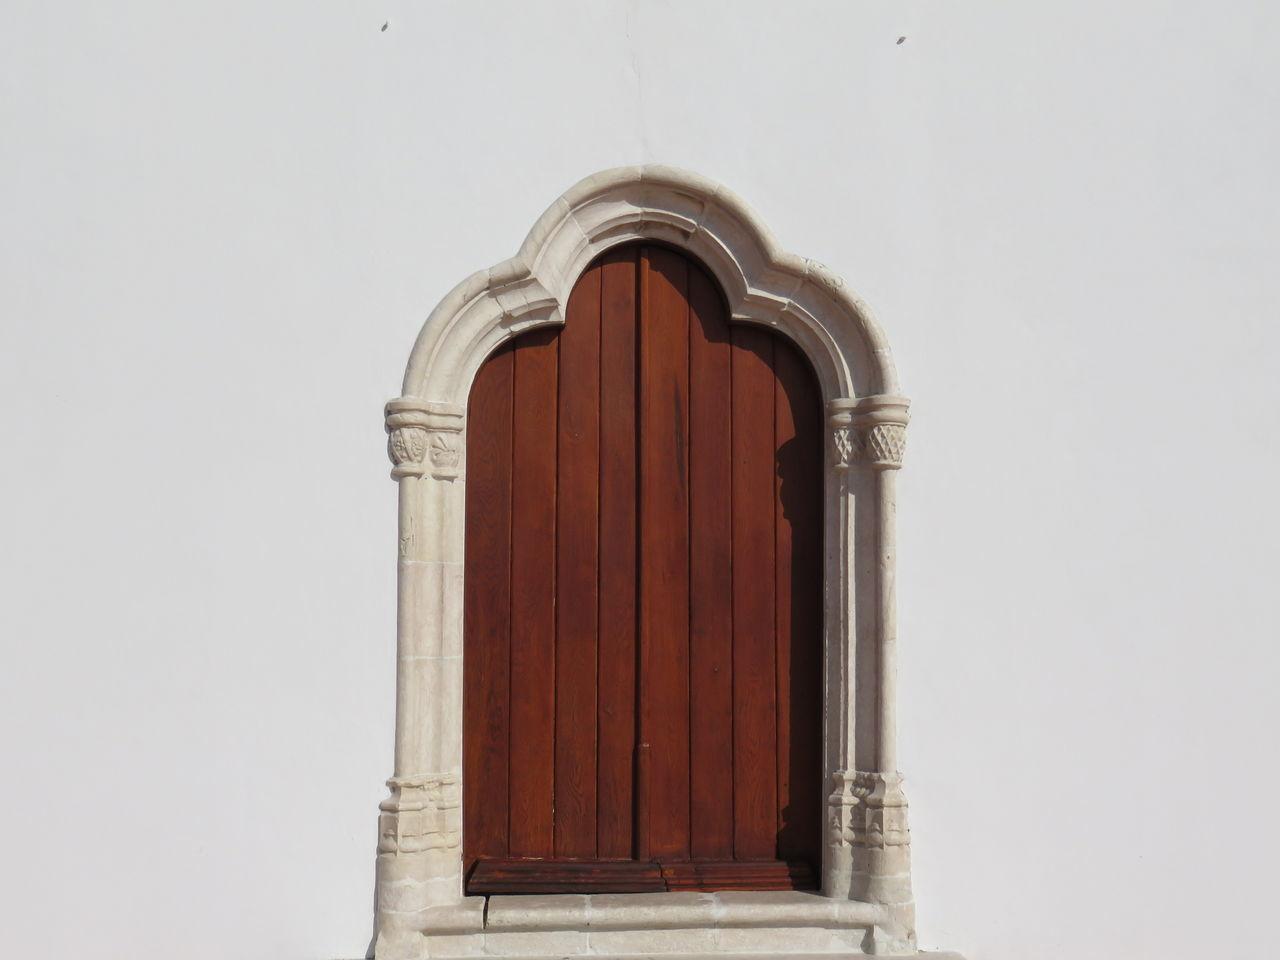 Beautiful stock photos of sicherheit, Architecture, Building, Building Exterior, Built Structure